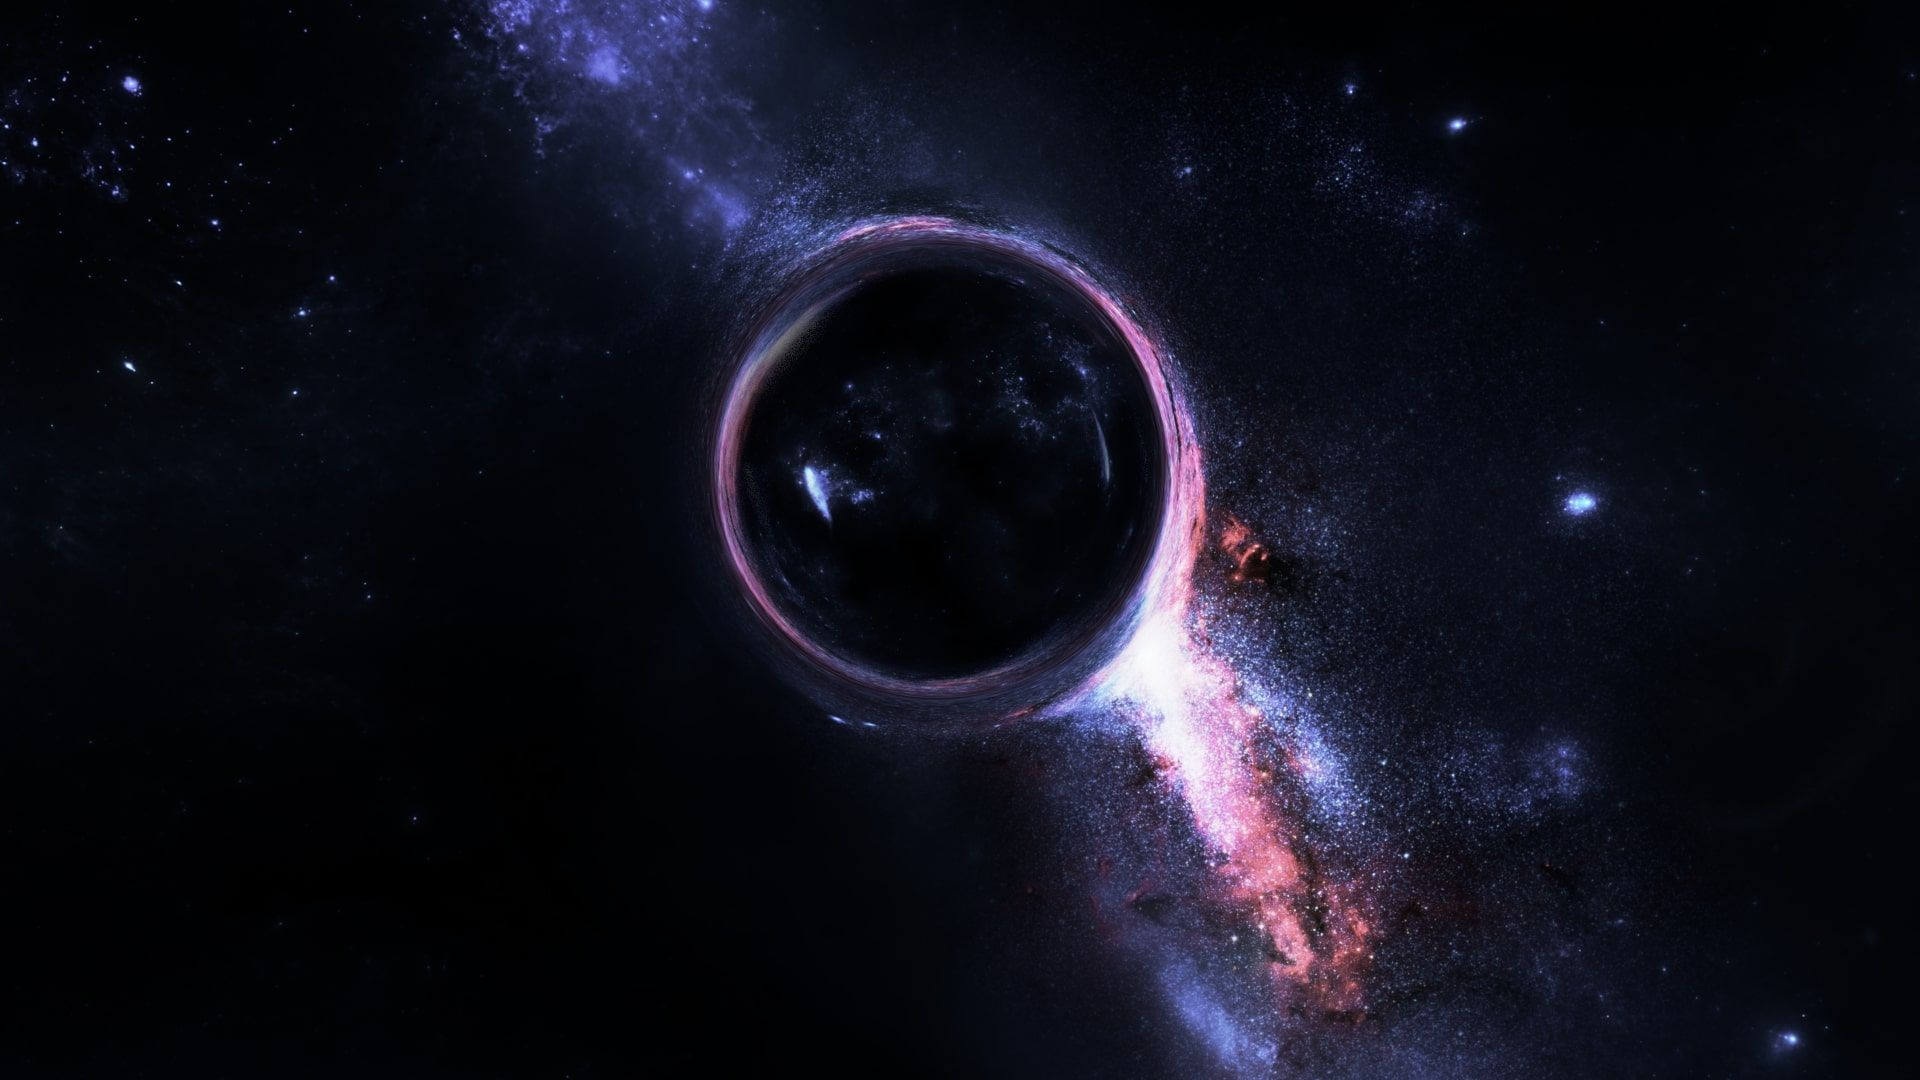 Black Hole Wallpapers On Wallpaperdog